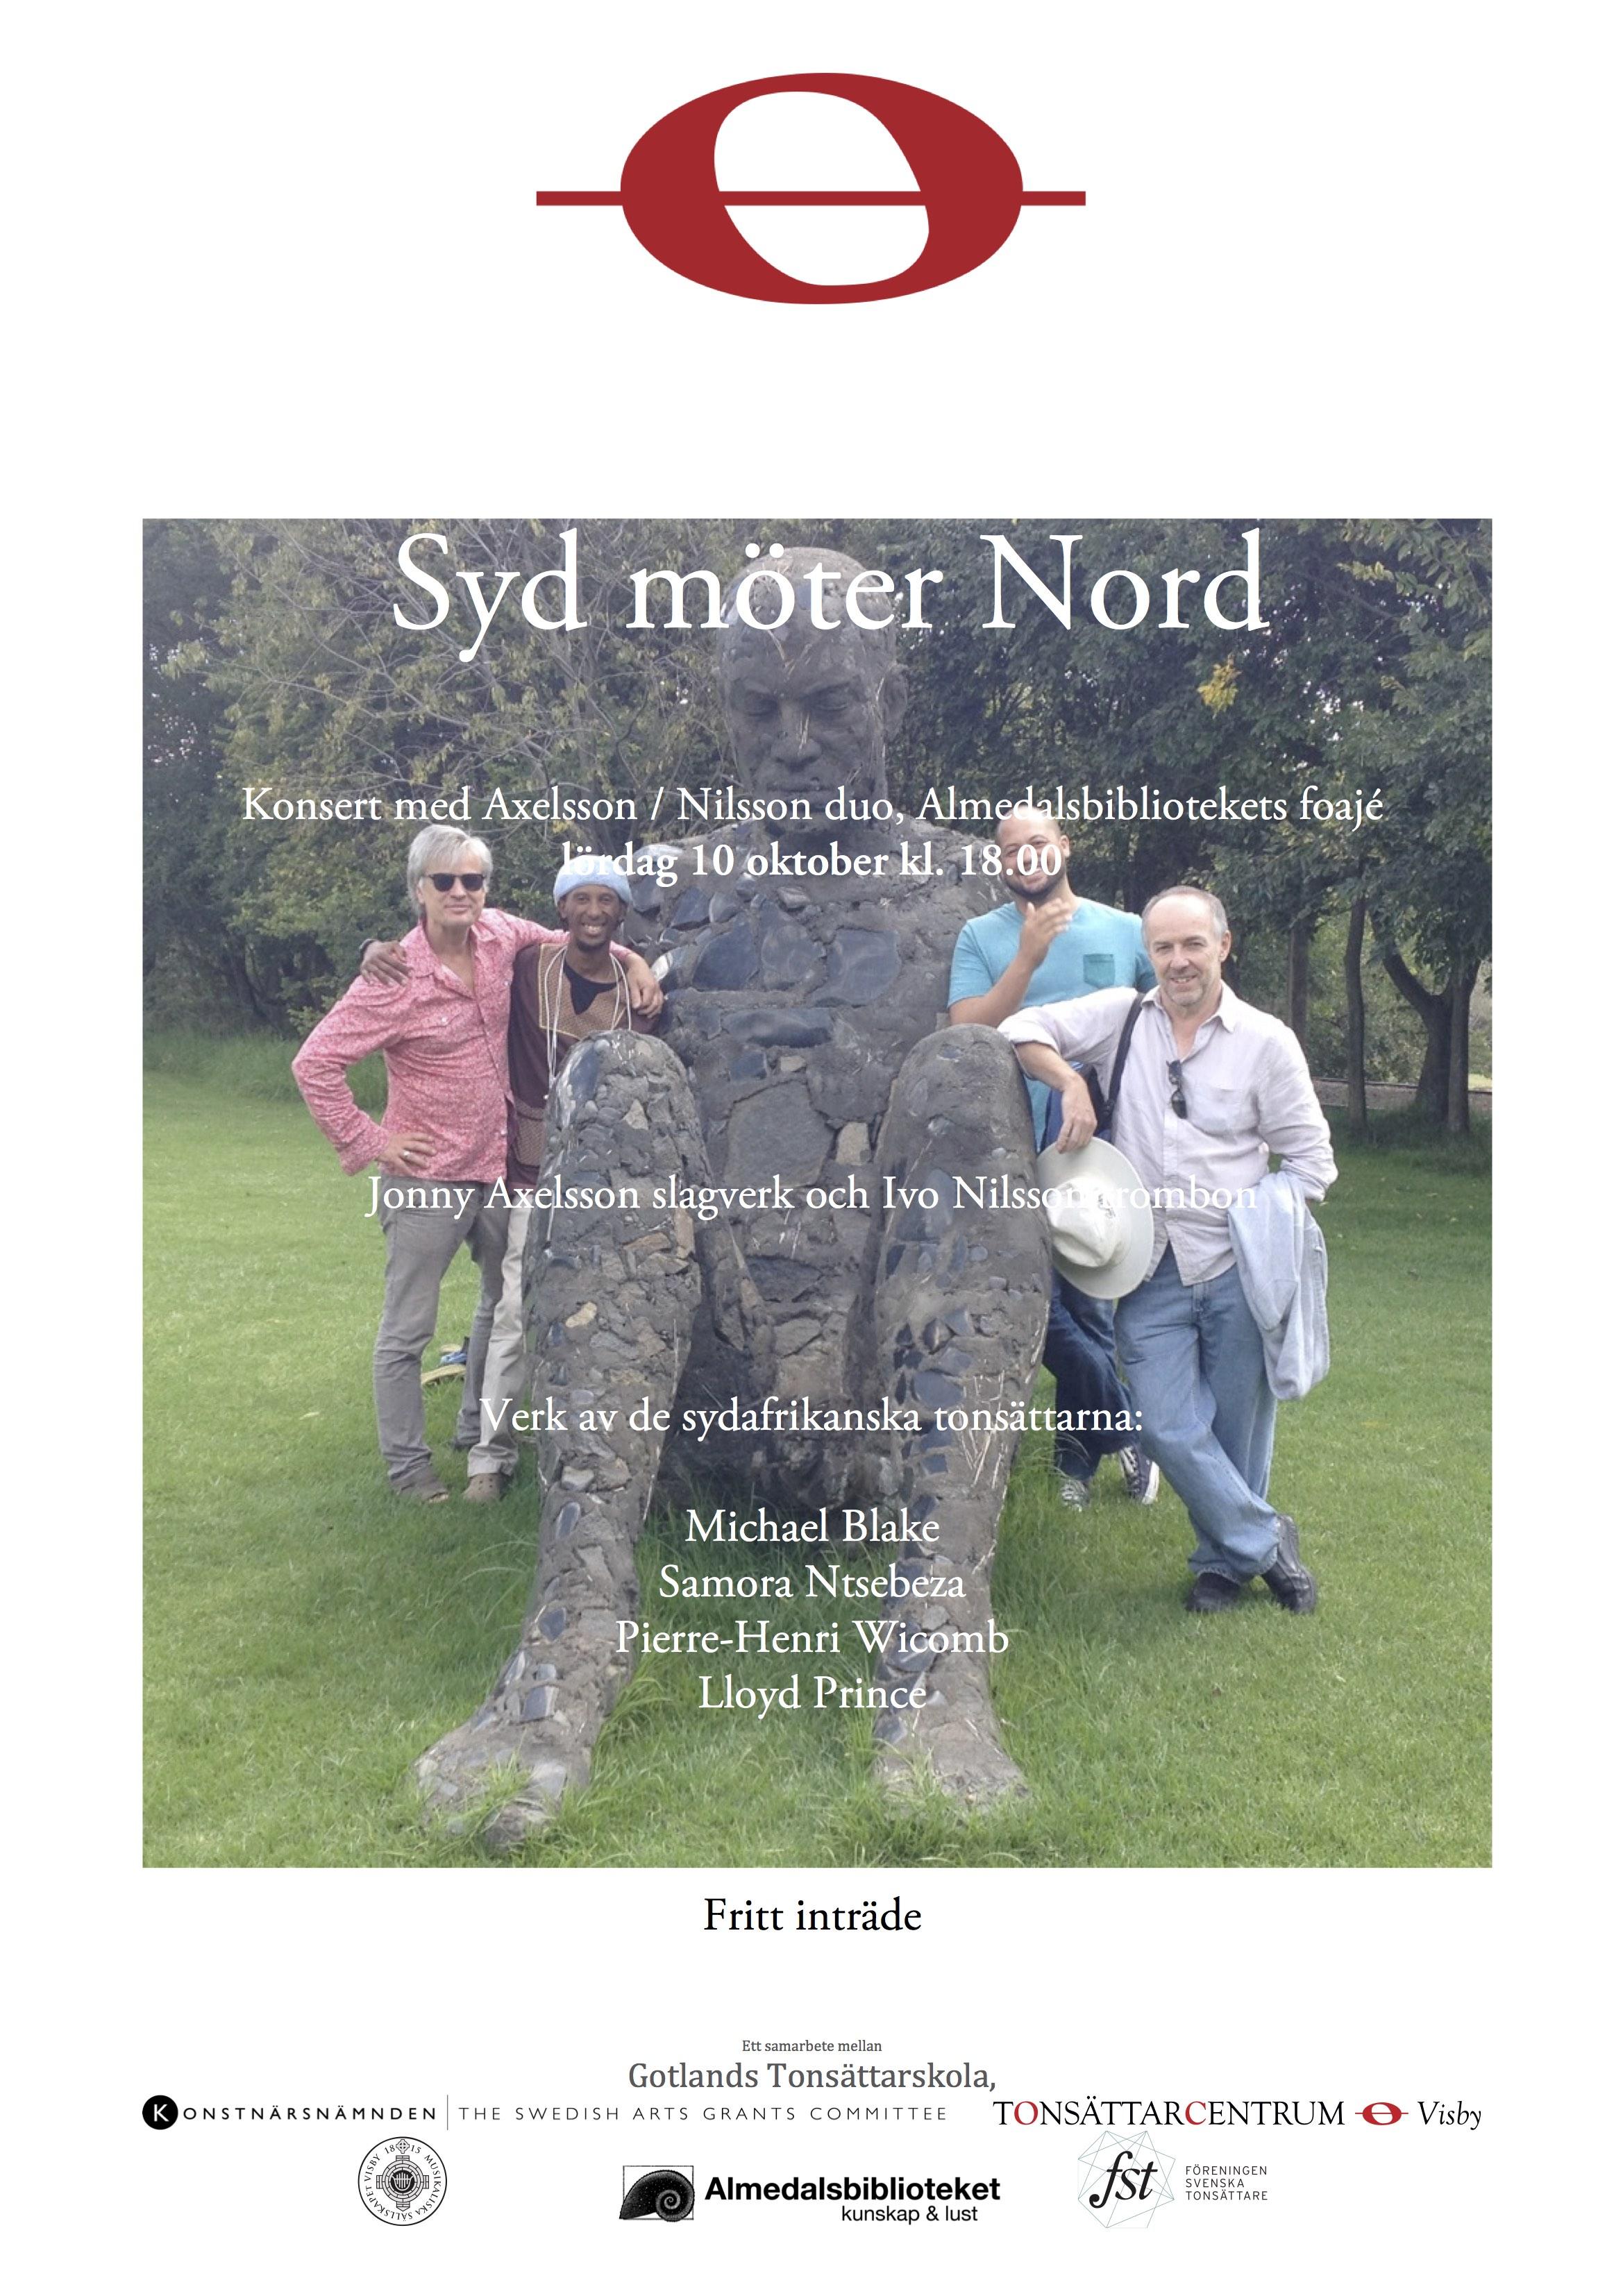 Syd-möter-nord-affisch